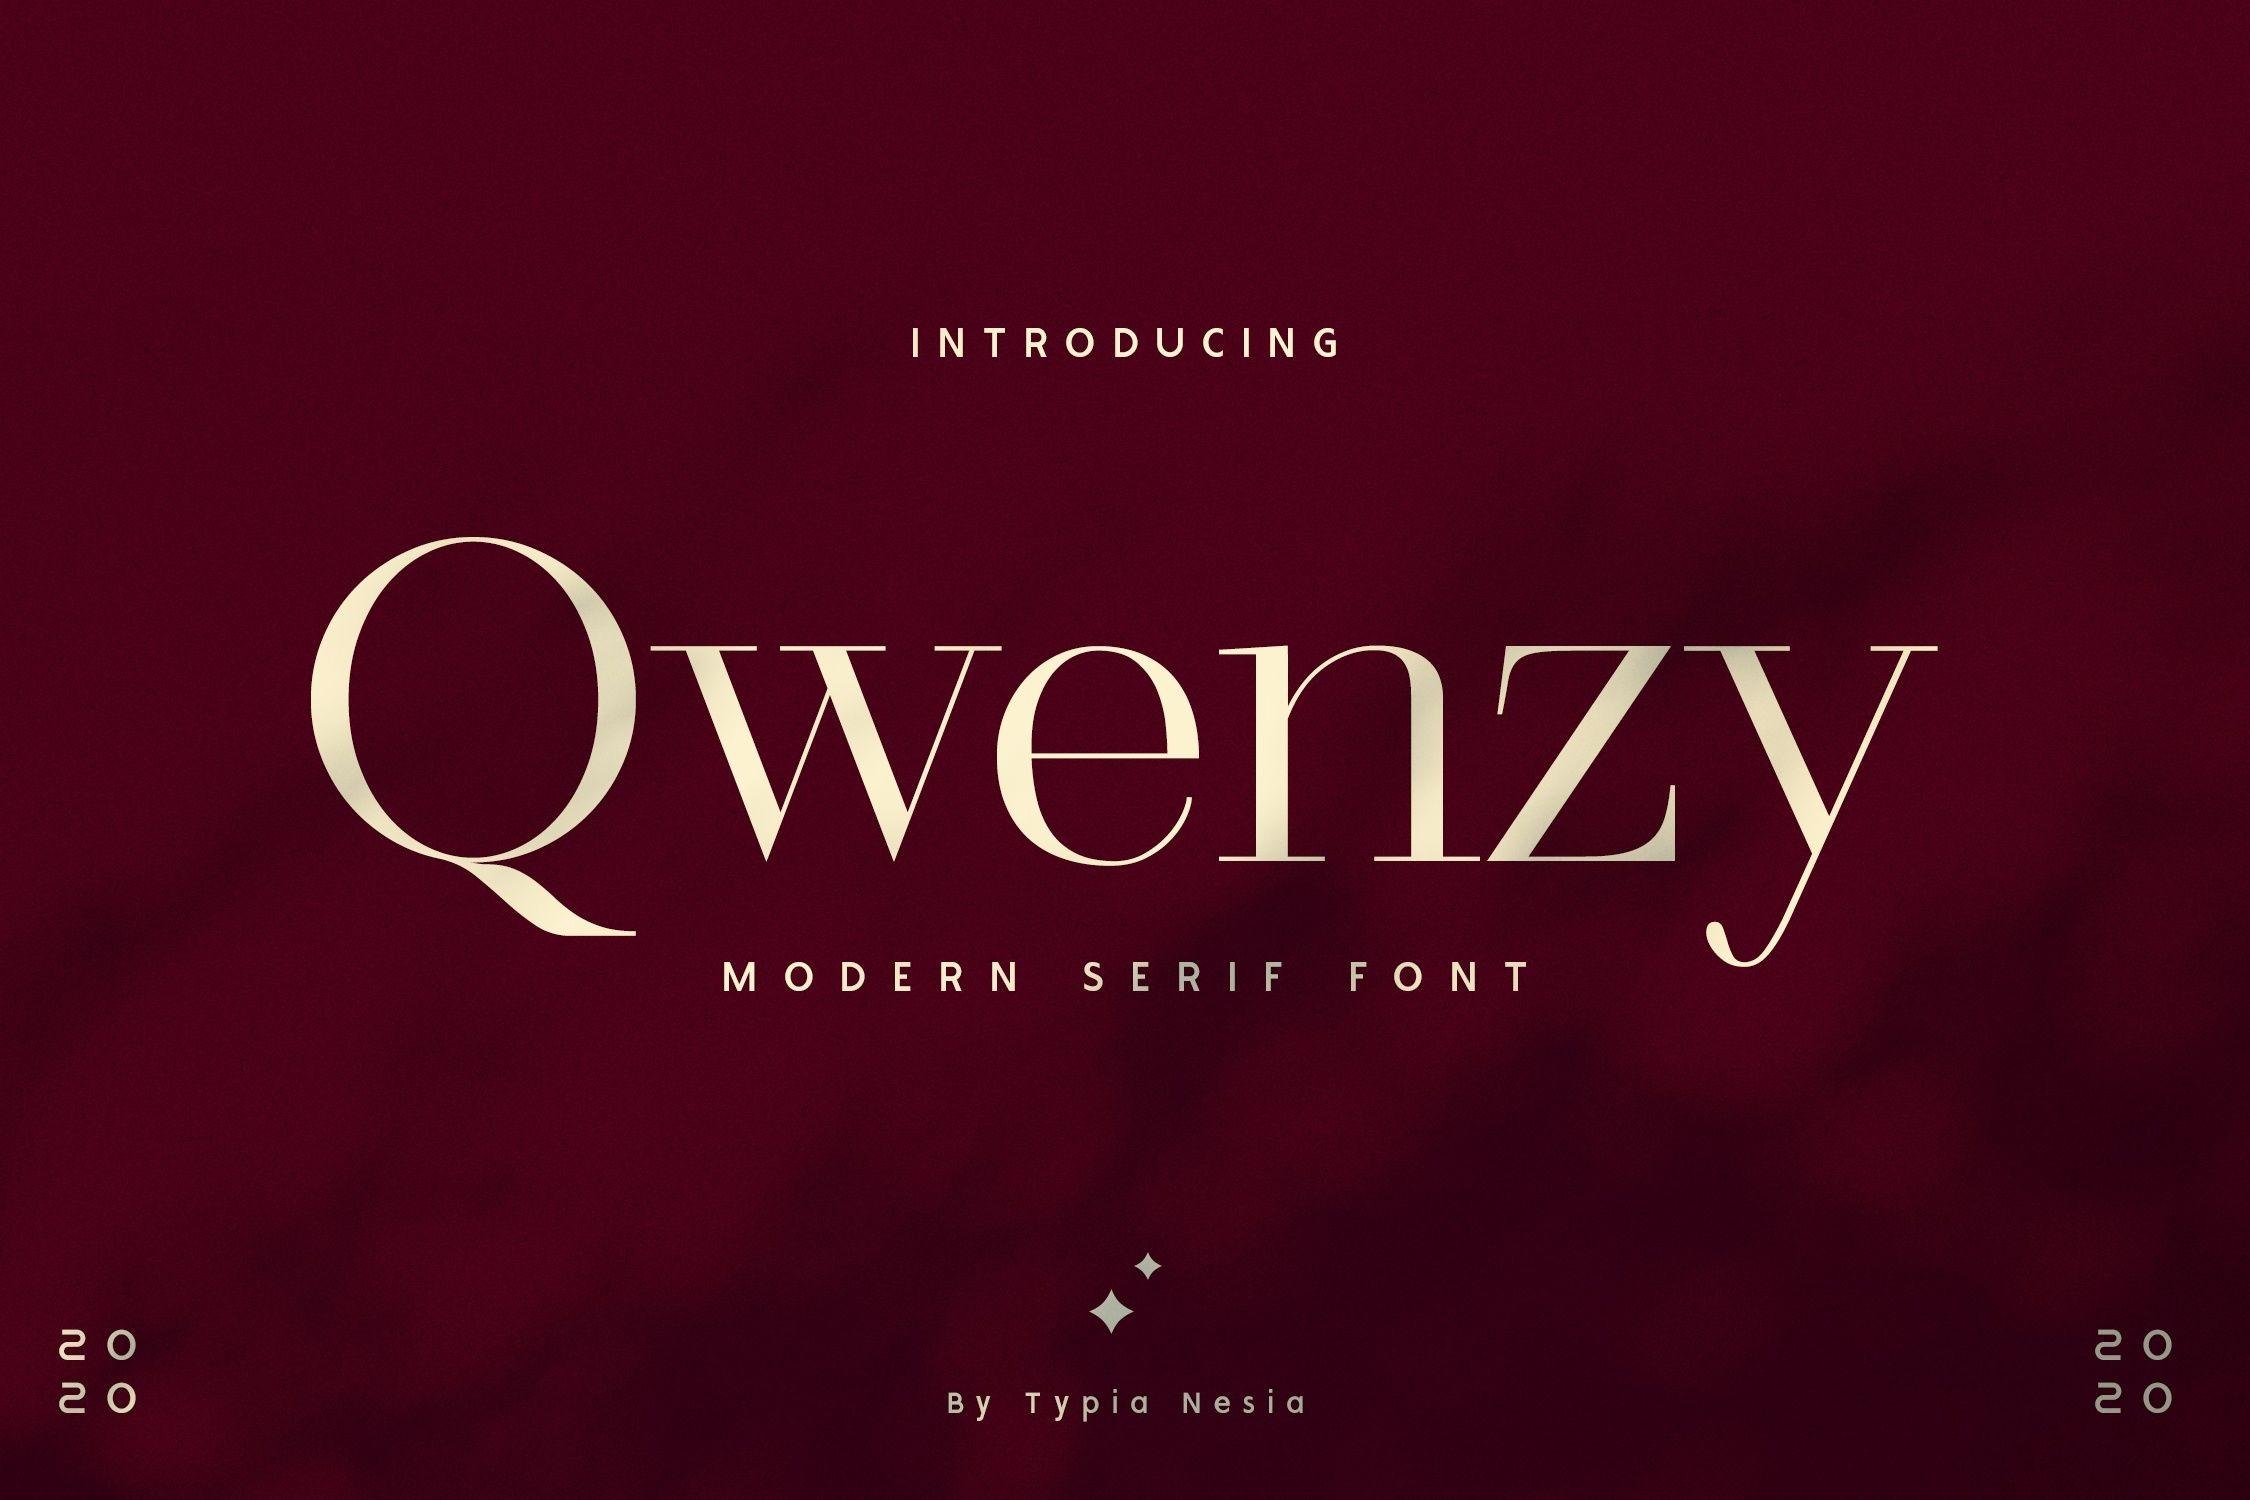 Qwenzy Modern Serif Font-1 (1)